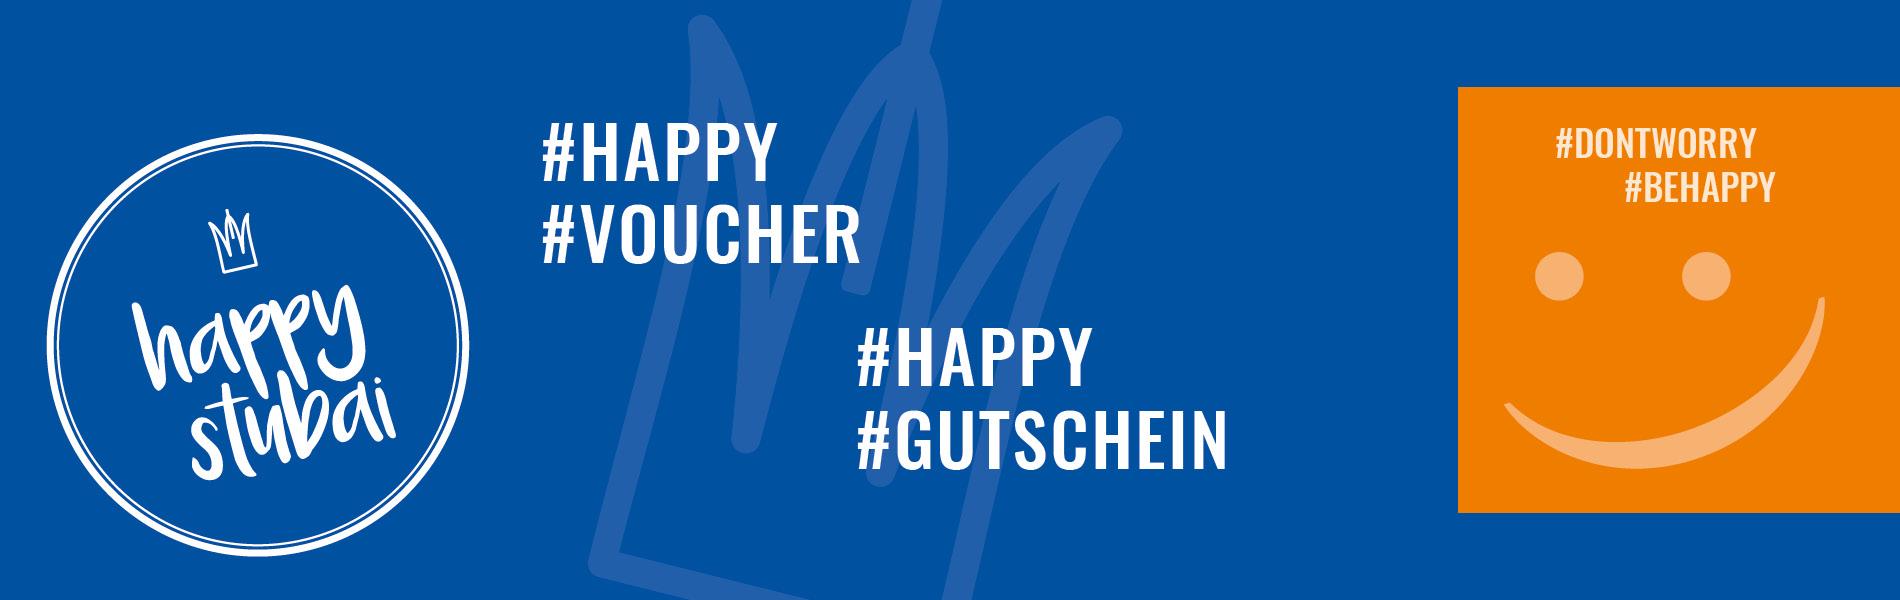 Happy Stubai Hotel Hostel Neustift Stubaital Tiro Austria - Gutschein